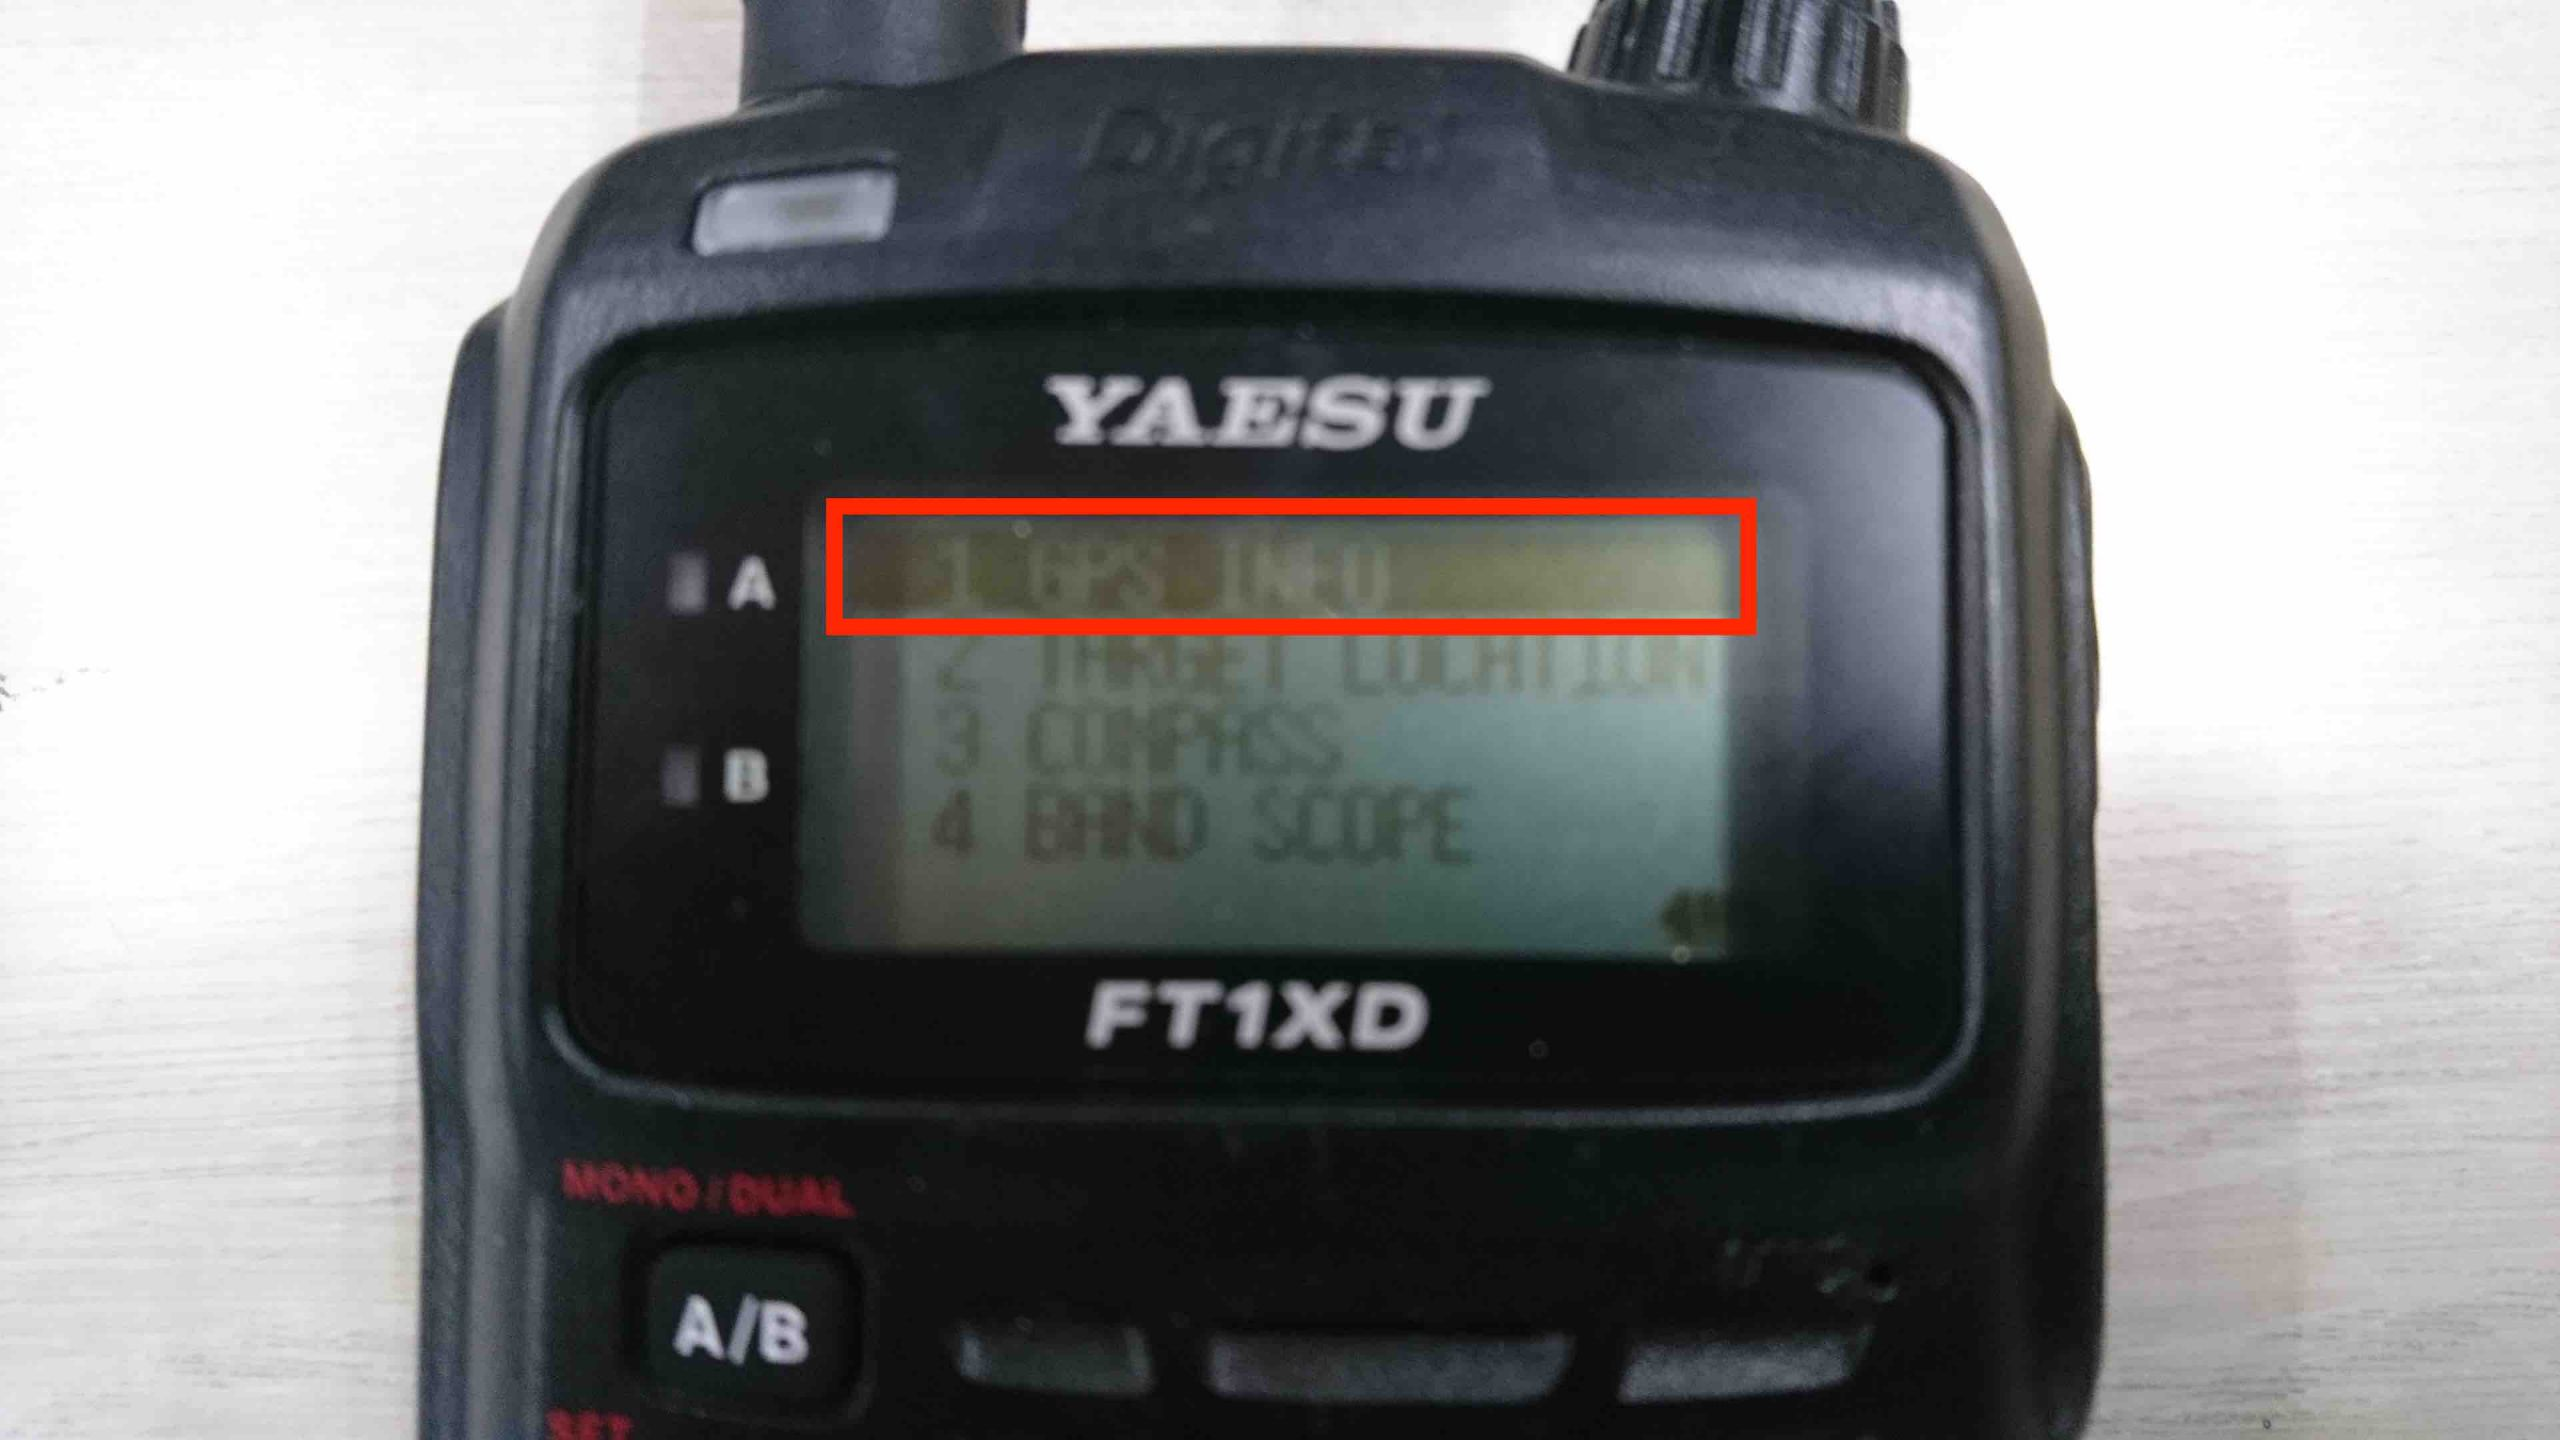 FT1XDのGPS情報表示方法